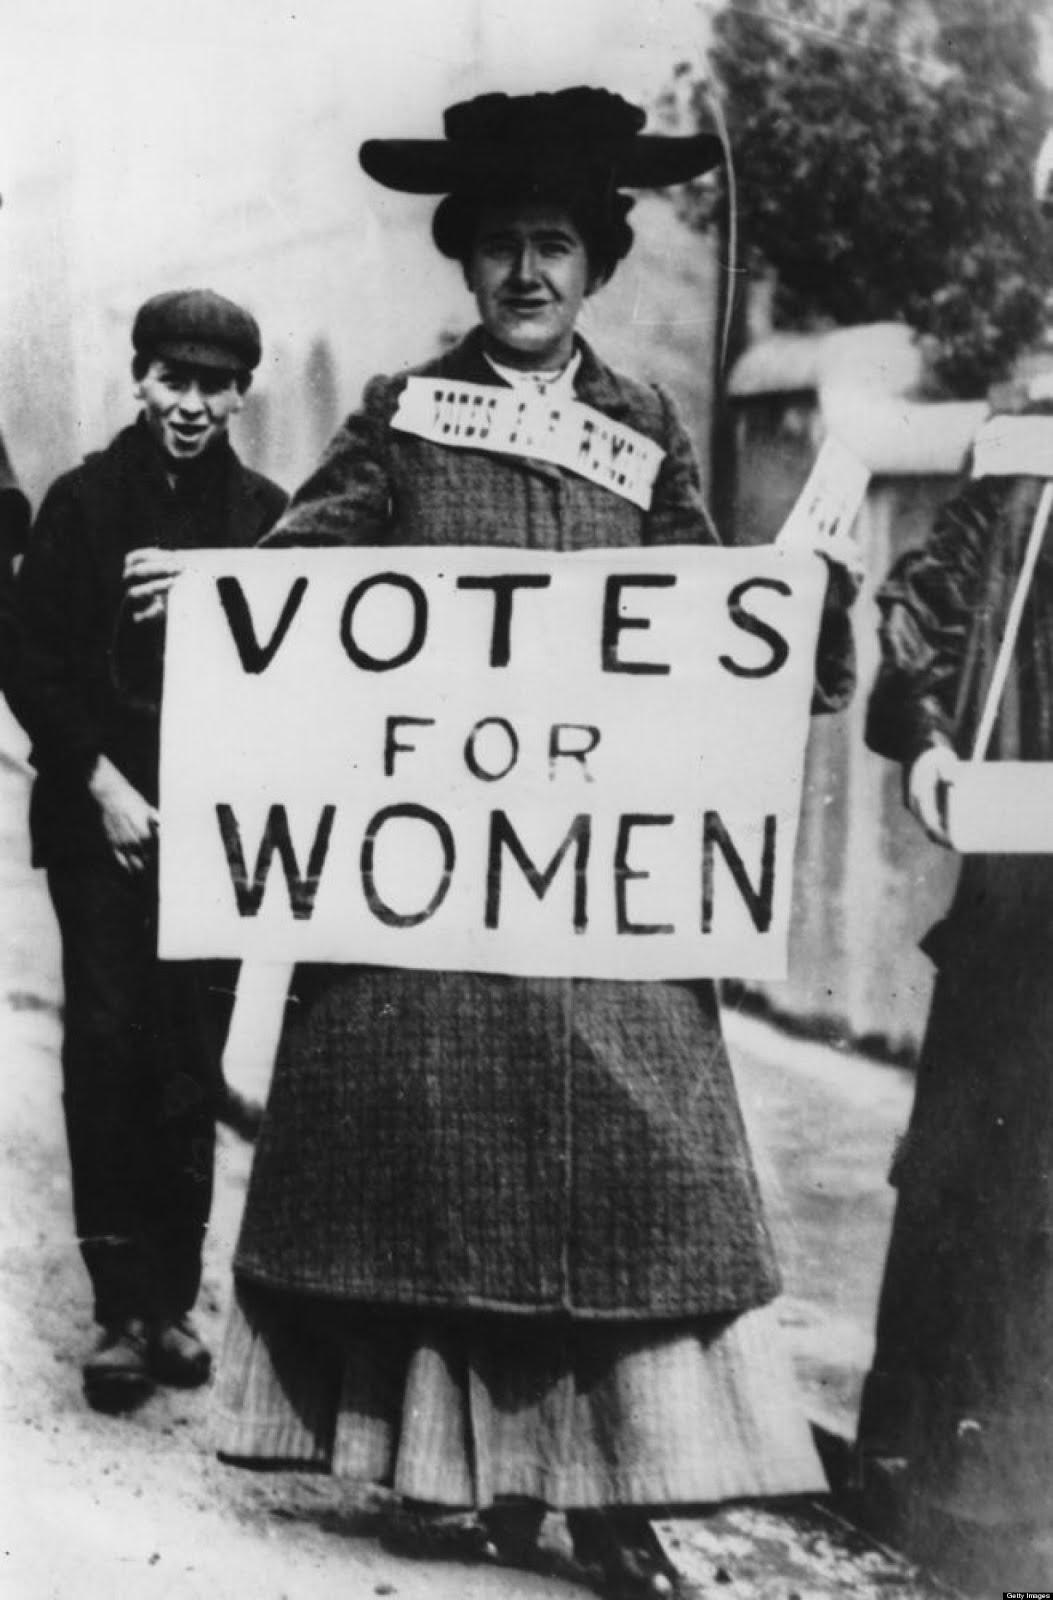 votes-4-women.jpg